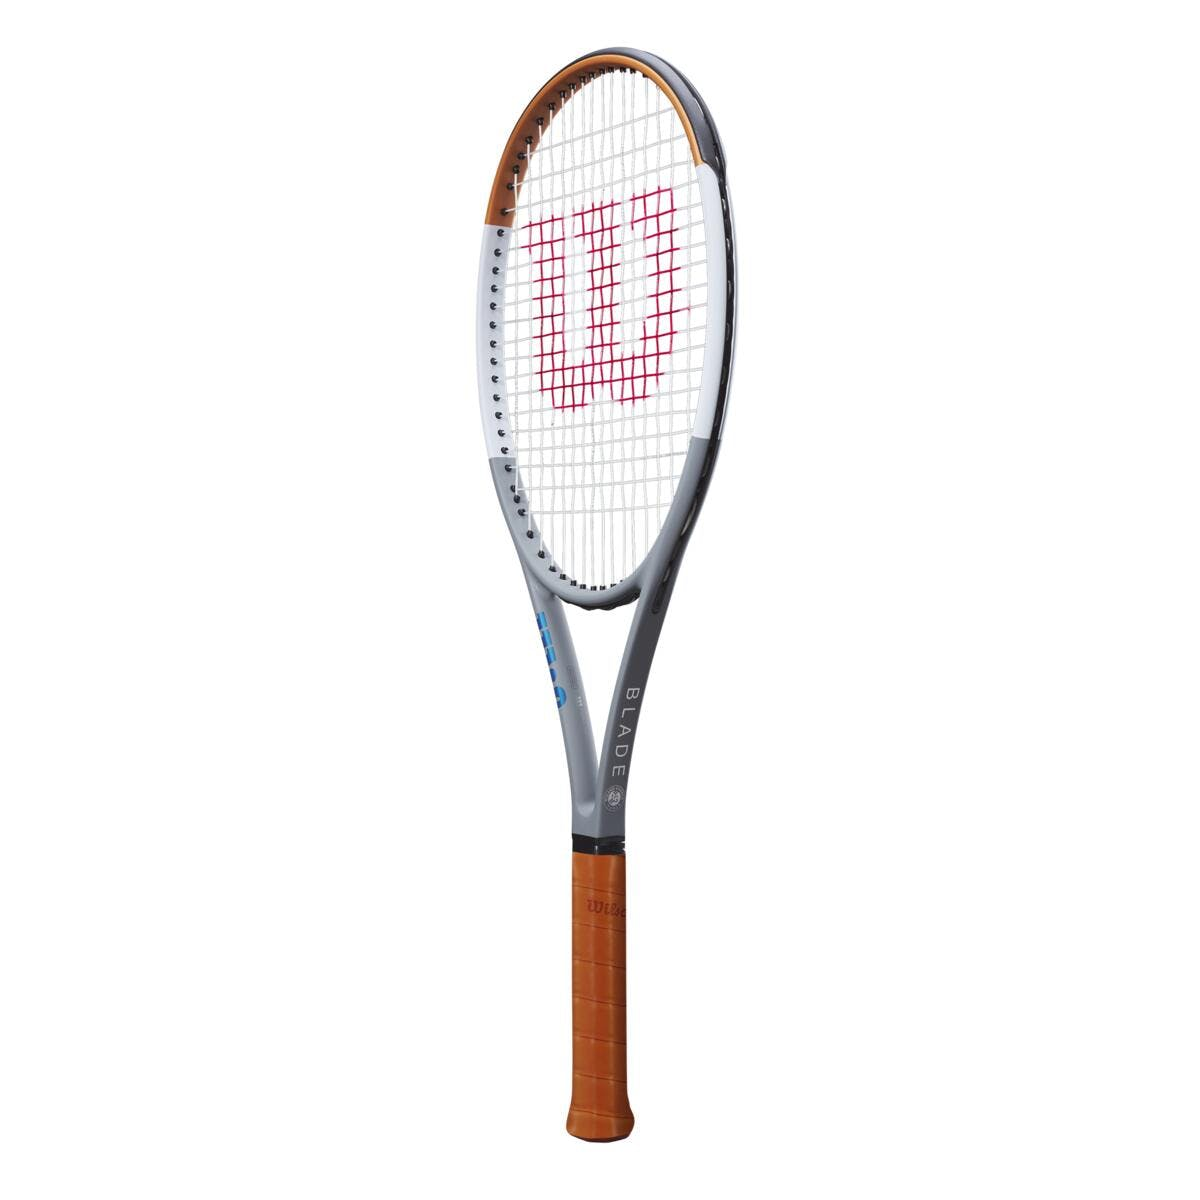 Raquette Blade, Wilson, Roland-Garros